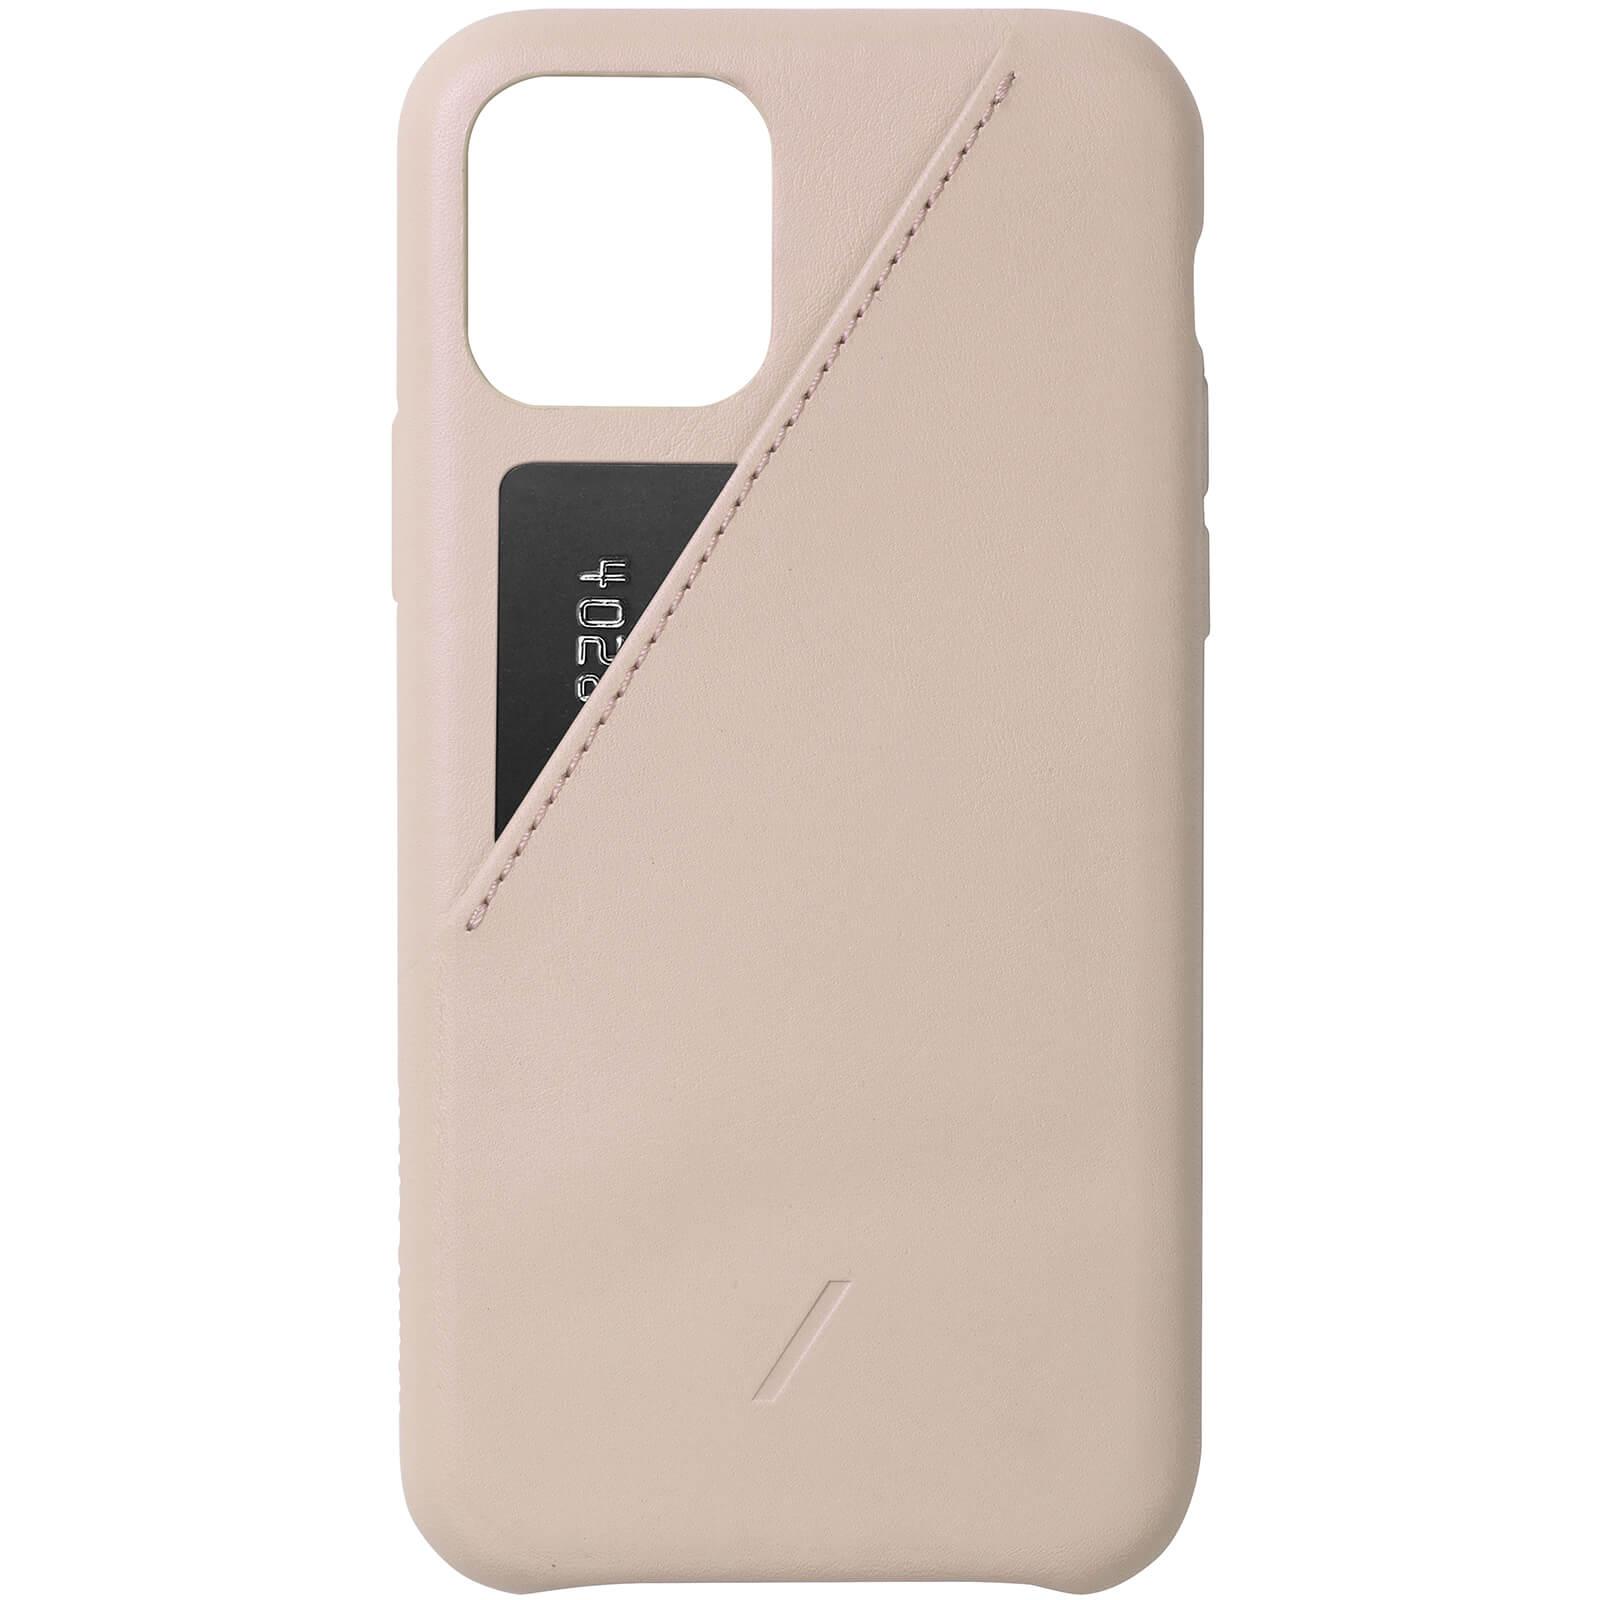 Native Union Clic Card iPhone Case - Nude - iPhone 11 Pro